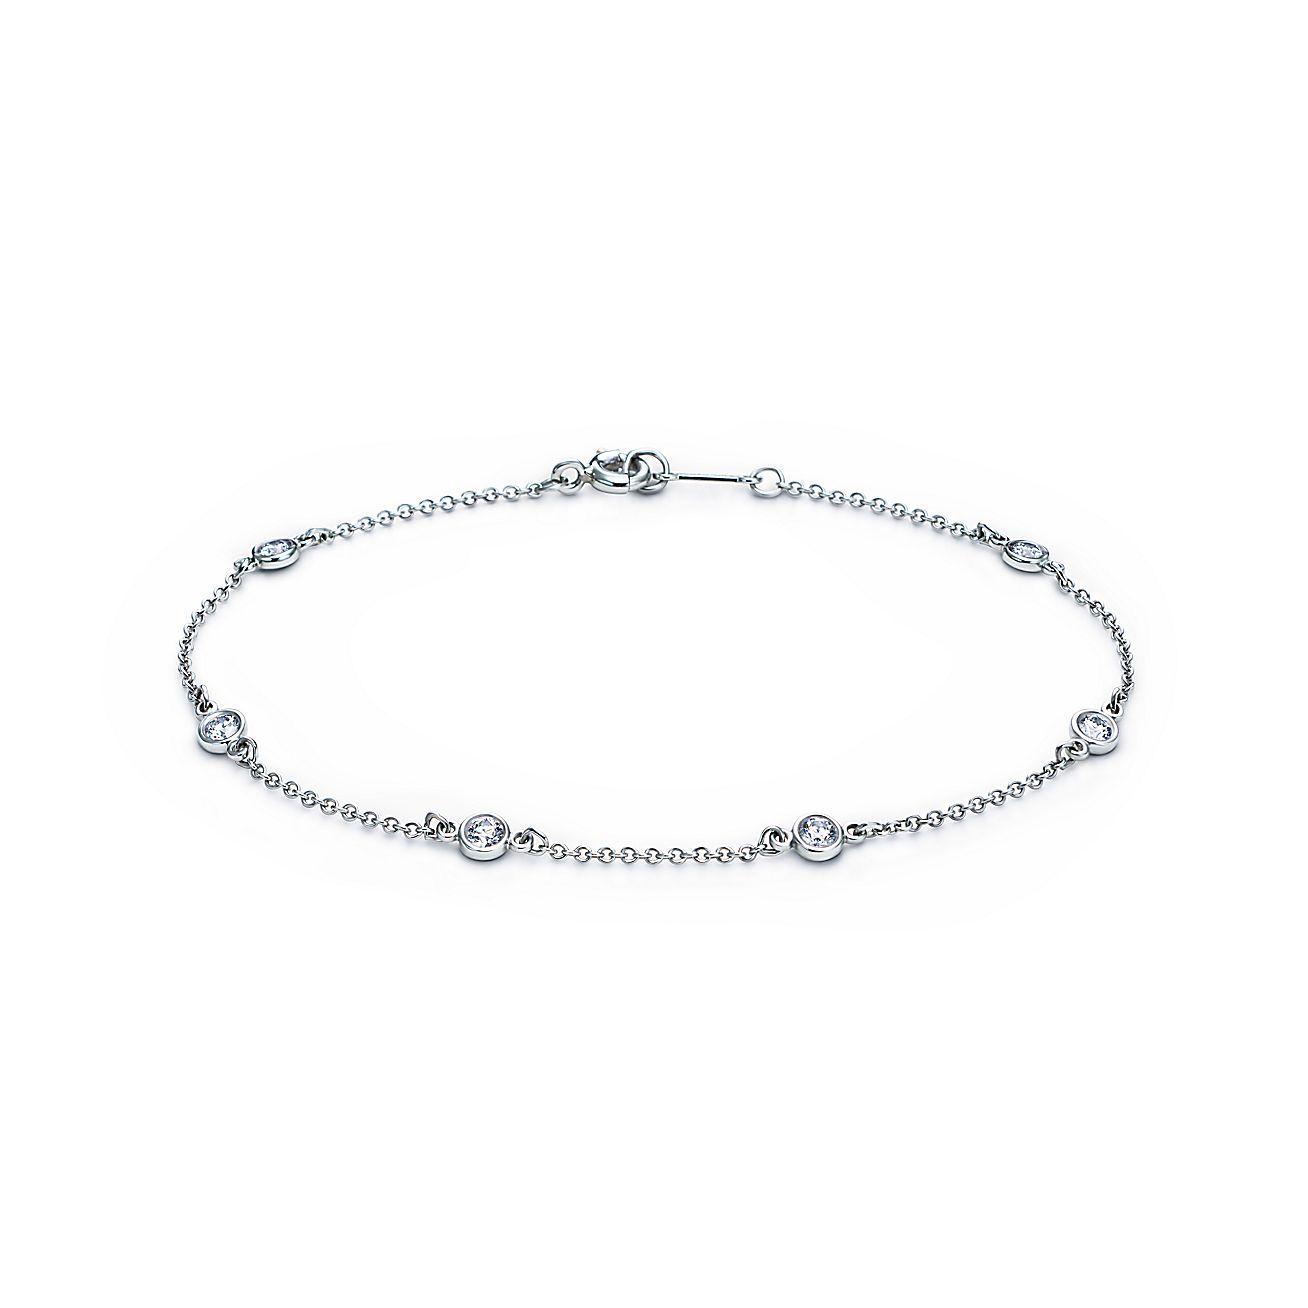 Elsa peretti diamonds by the yard bracelet diamonds for Diamonds by the yard ring